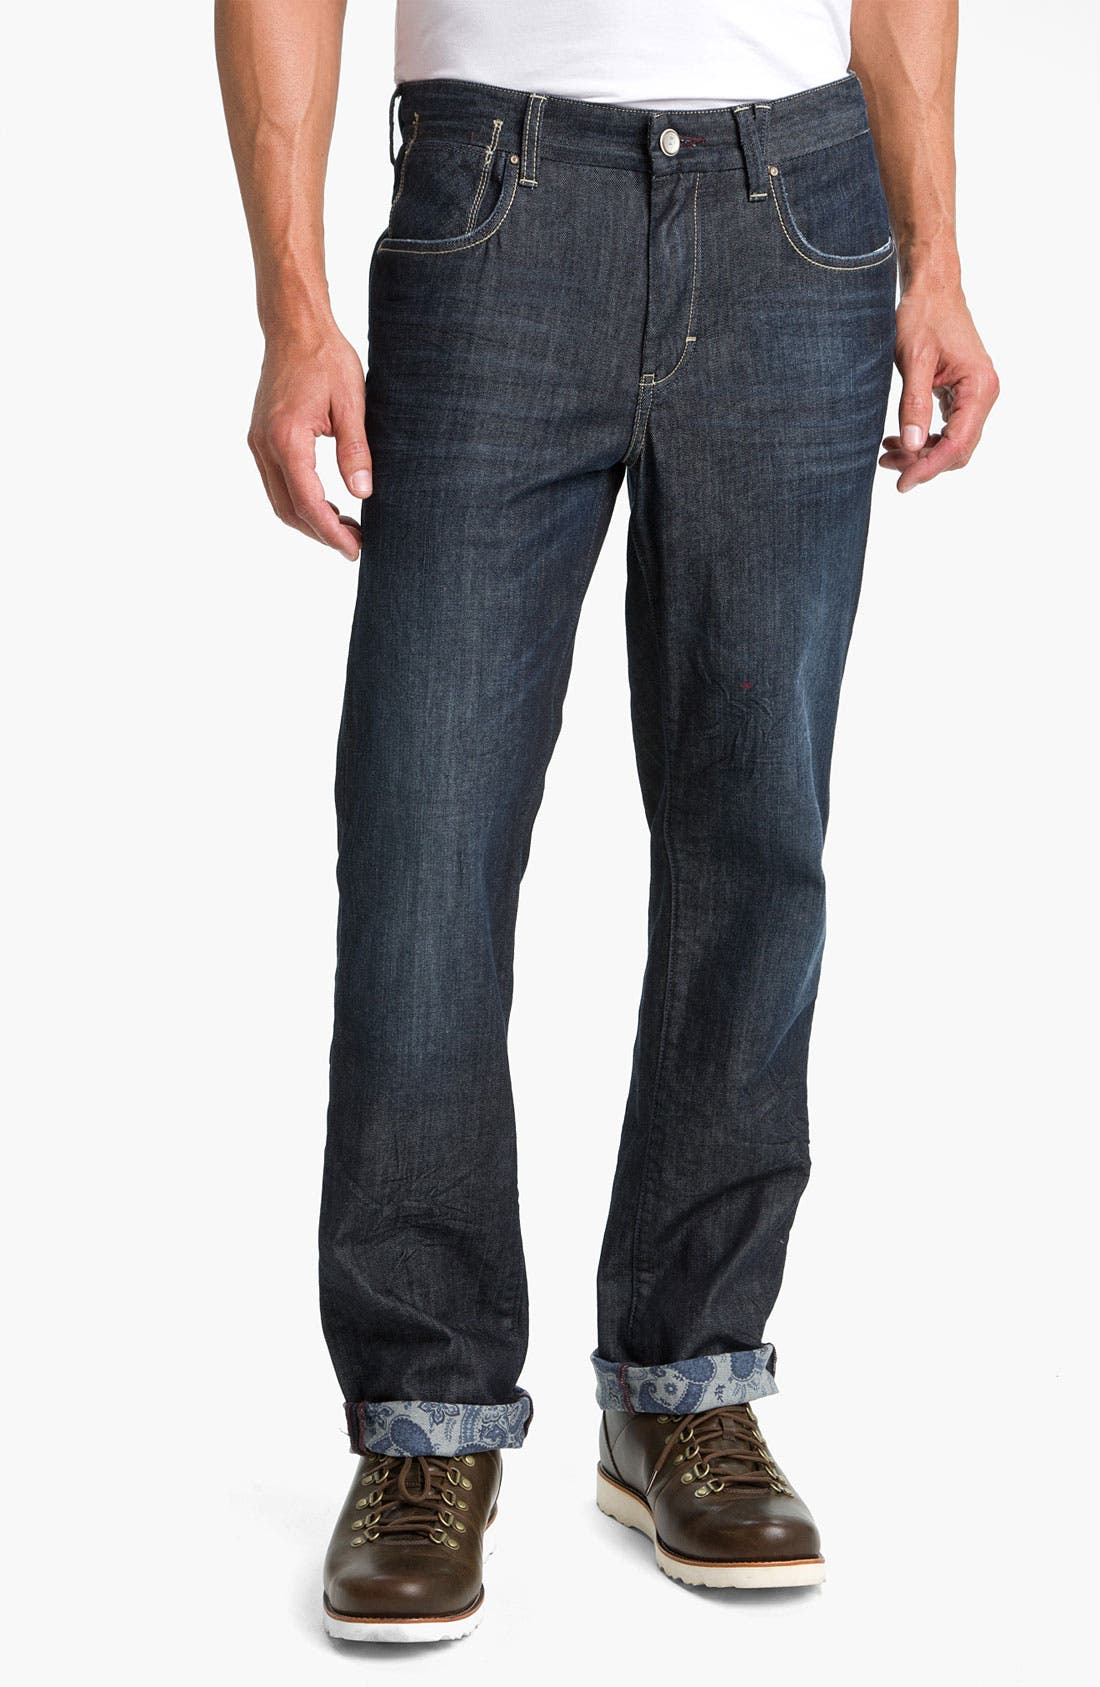 Alternate Image 1 Selected - Tommy Bahama Denim 'Antonio' Authentic Straight Leg Jeans (Crinkle Dark)